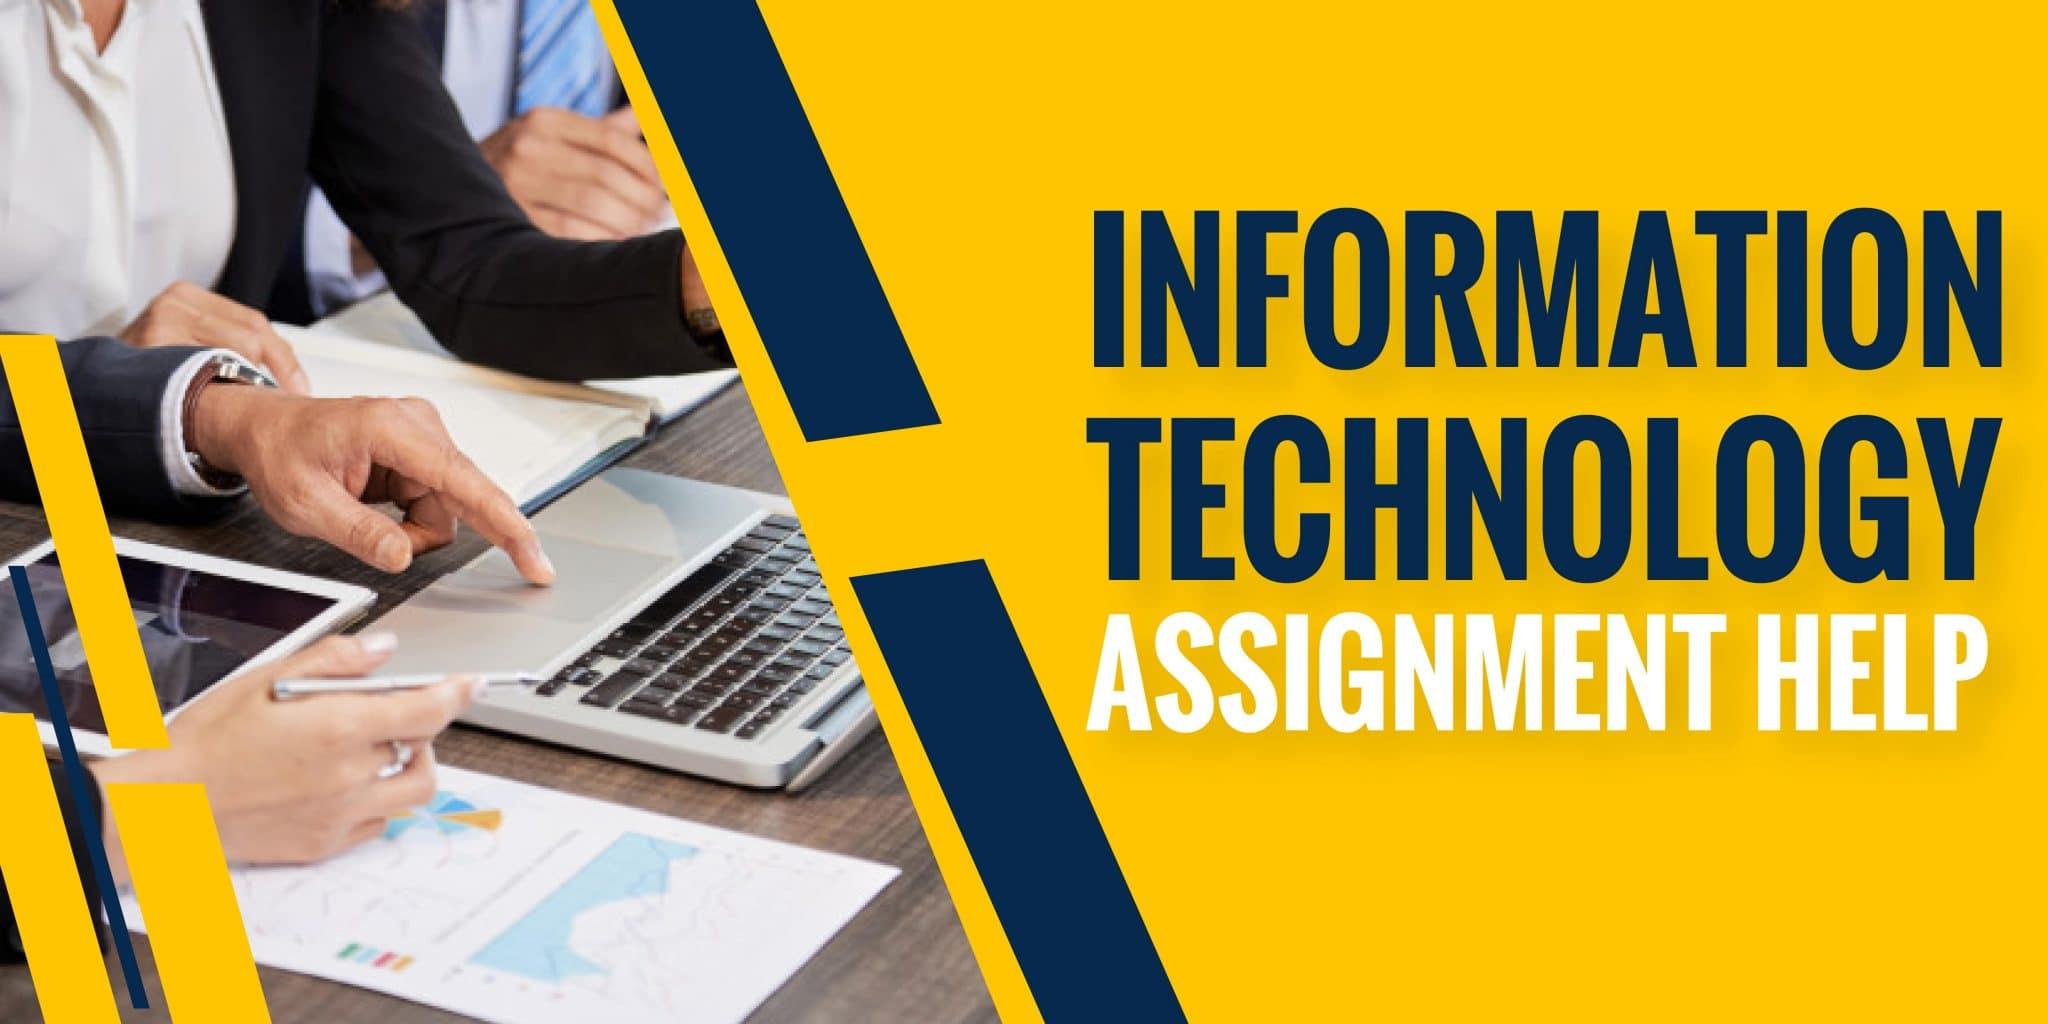 Information Technology Assignment Help